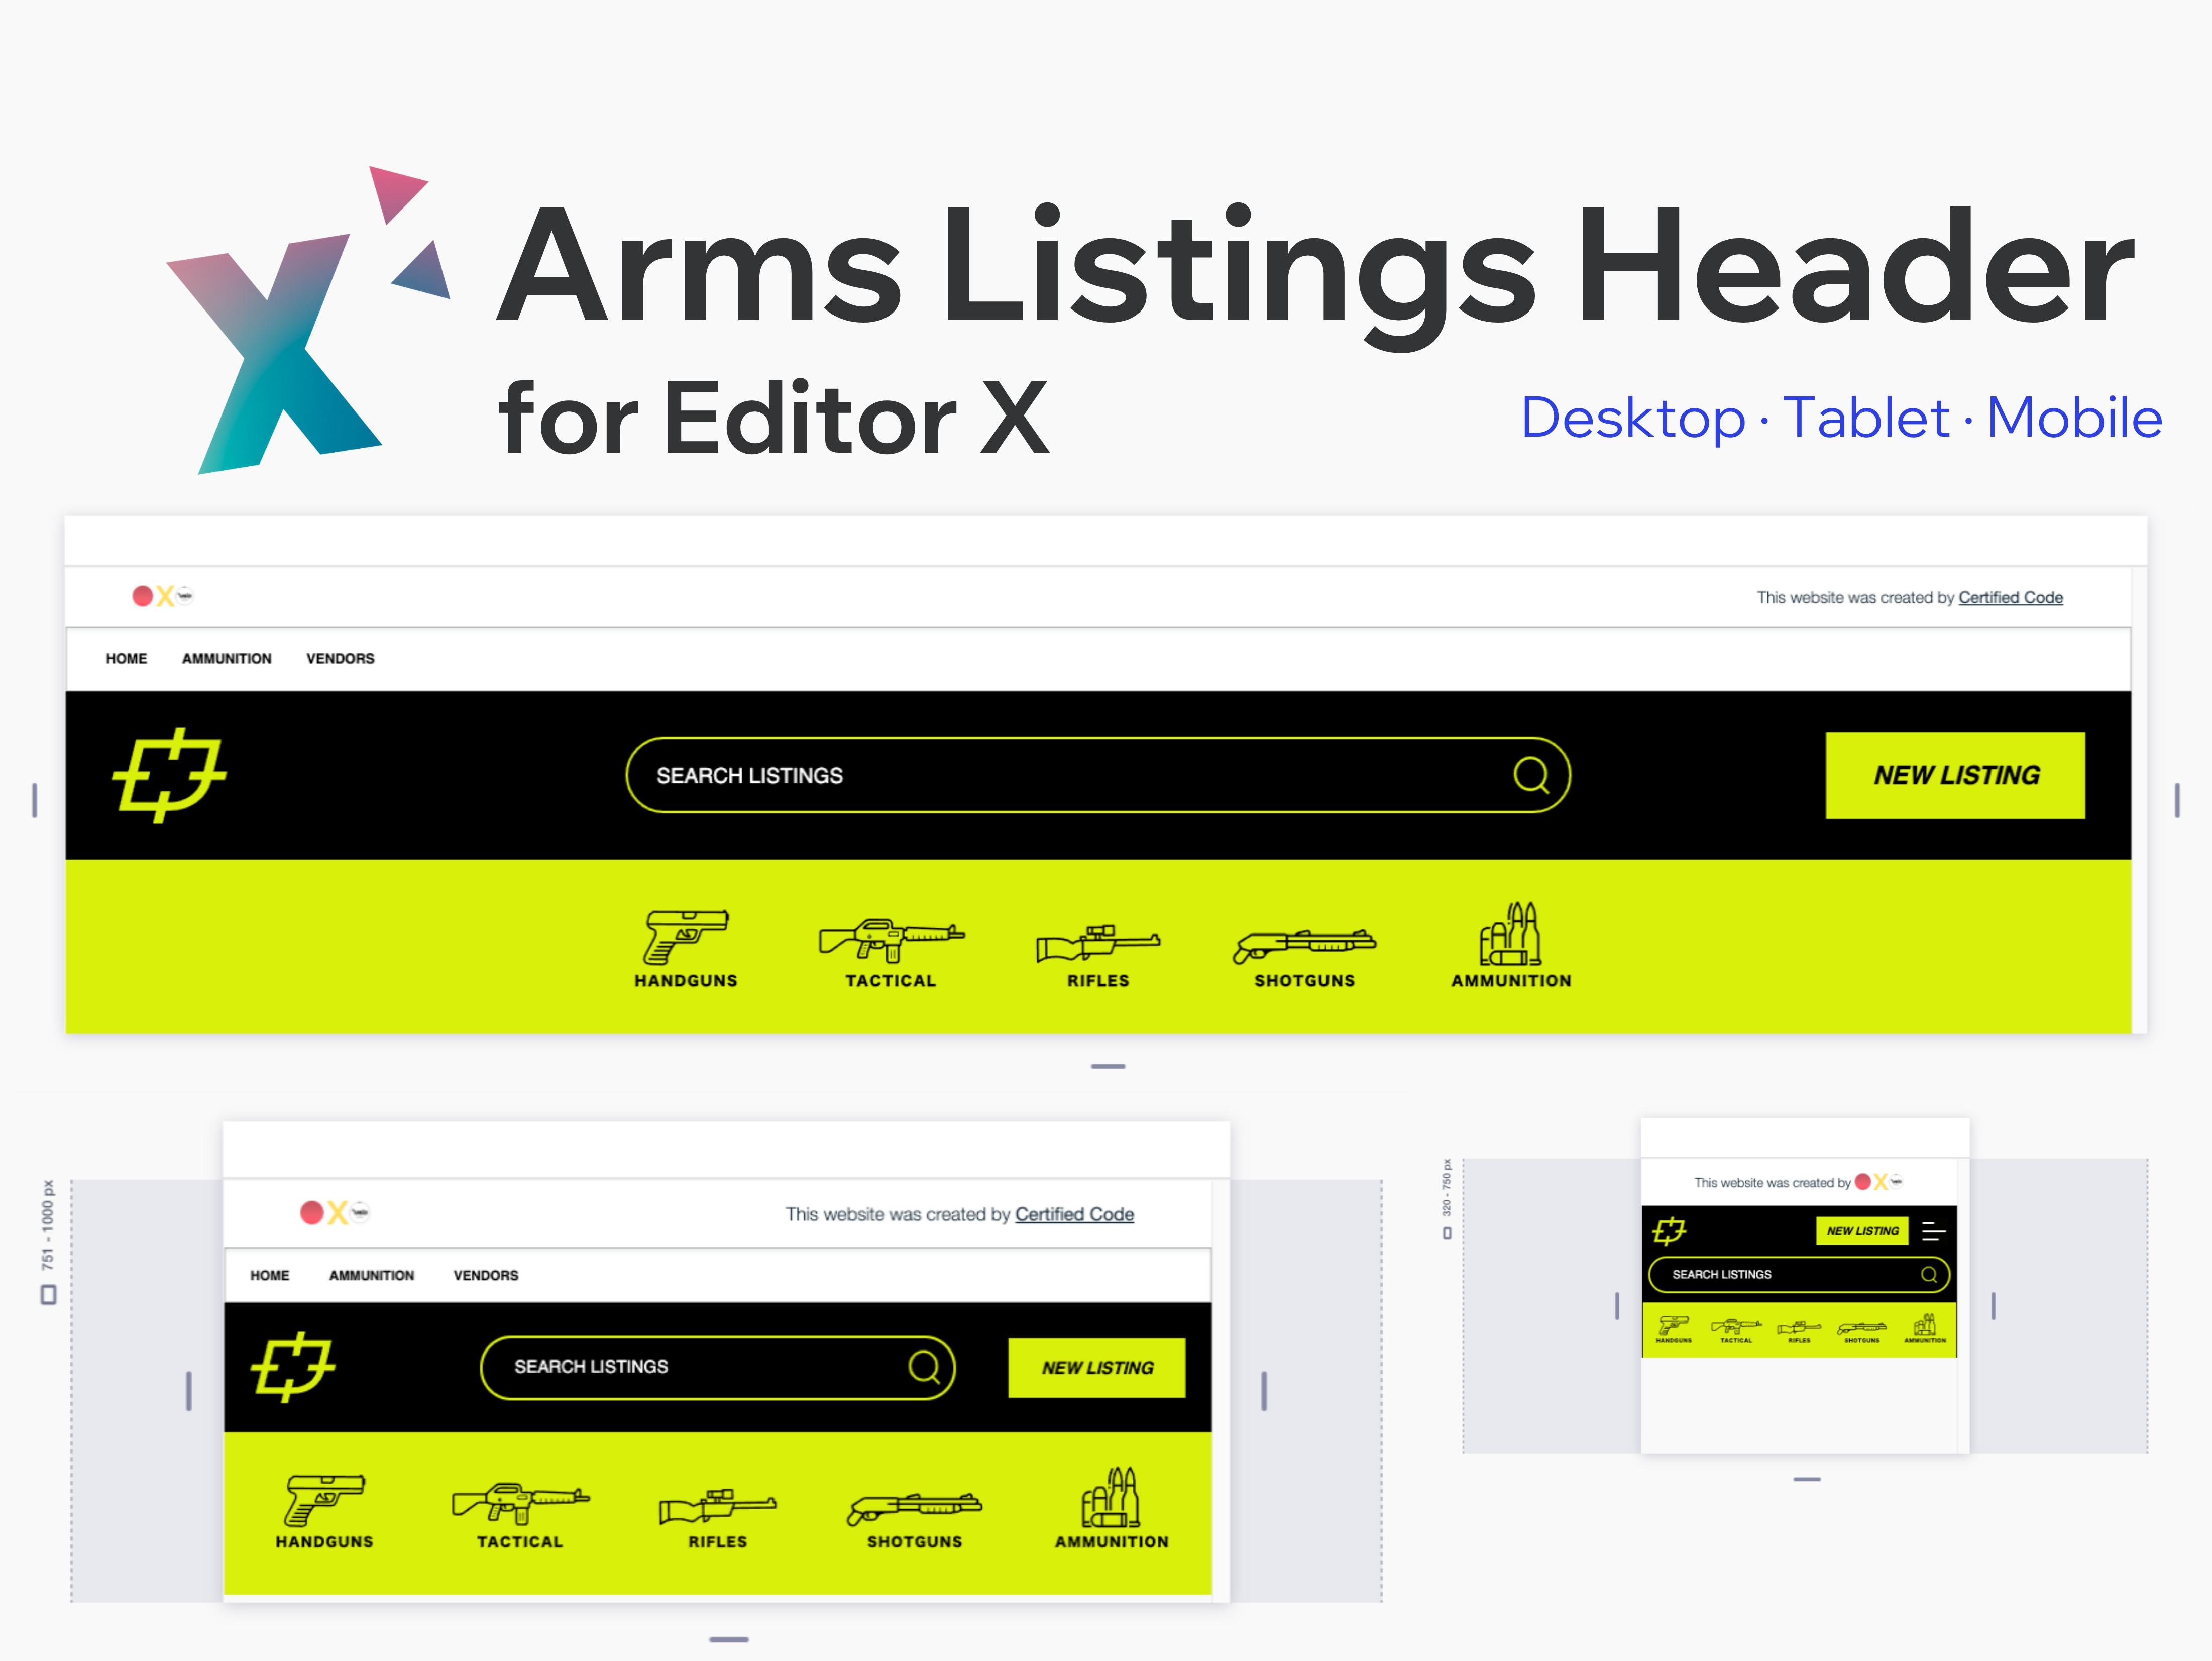 Arms Listings Header